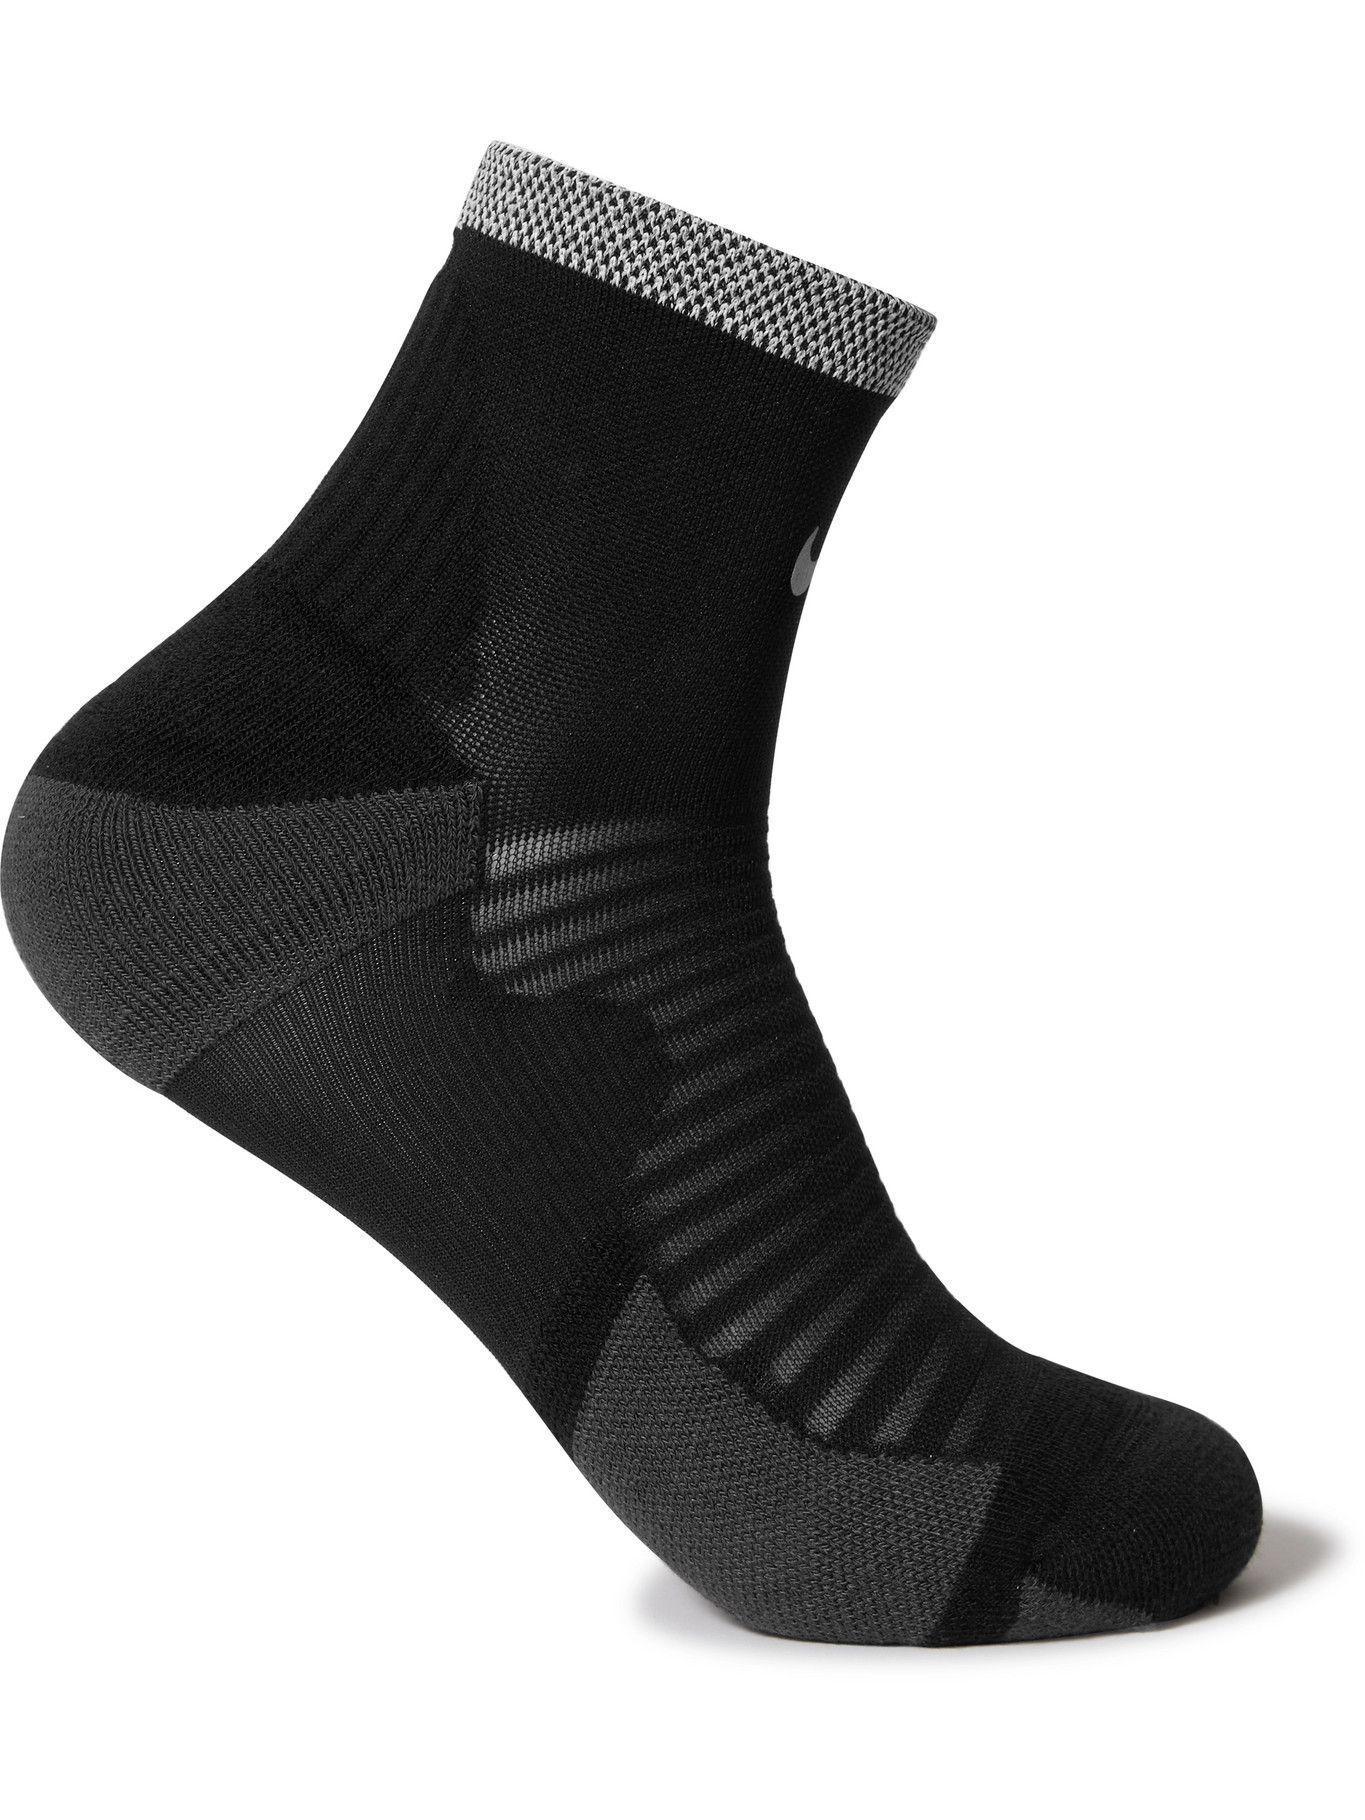 NIKE RUNNING - Spark Cushioned Dri-FIT Socks - Black - US 6